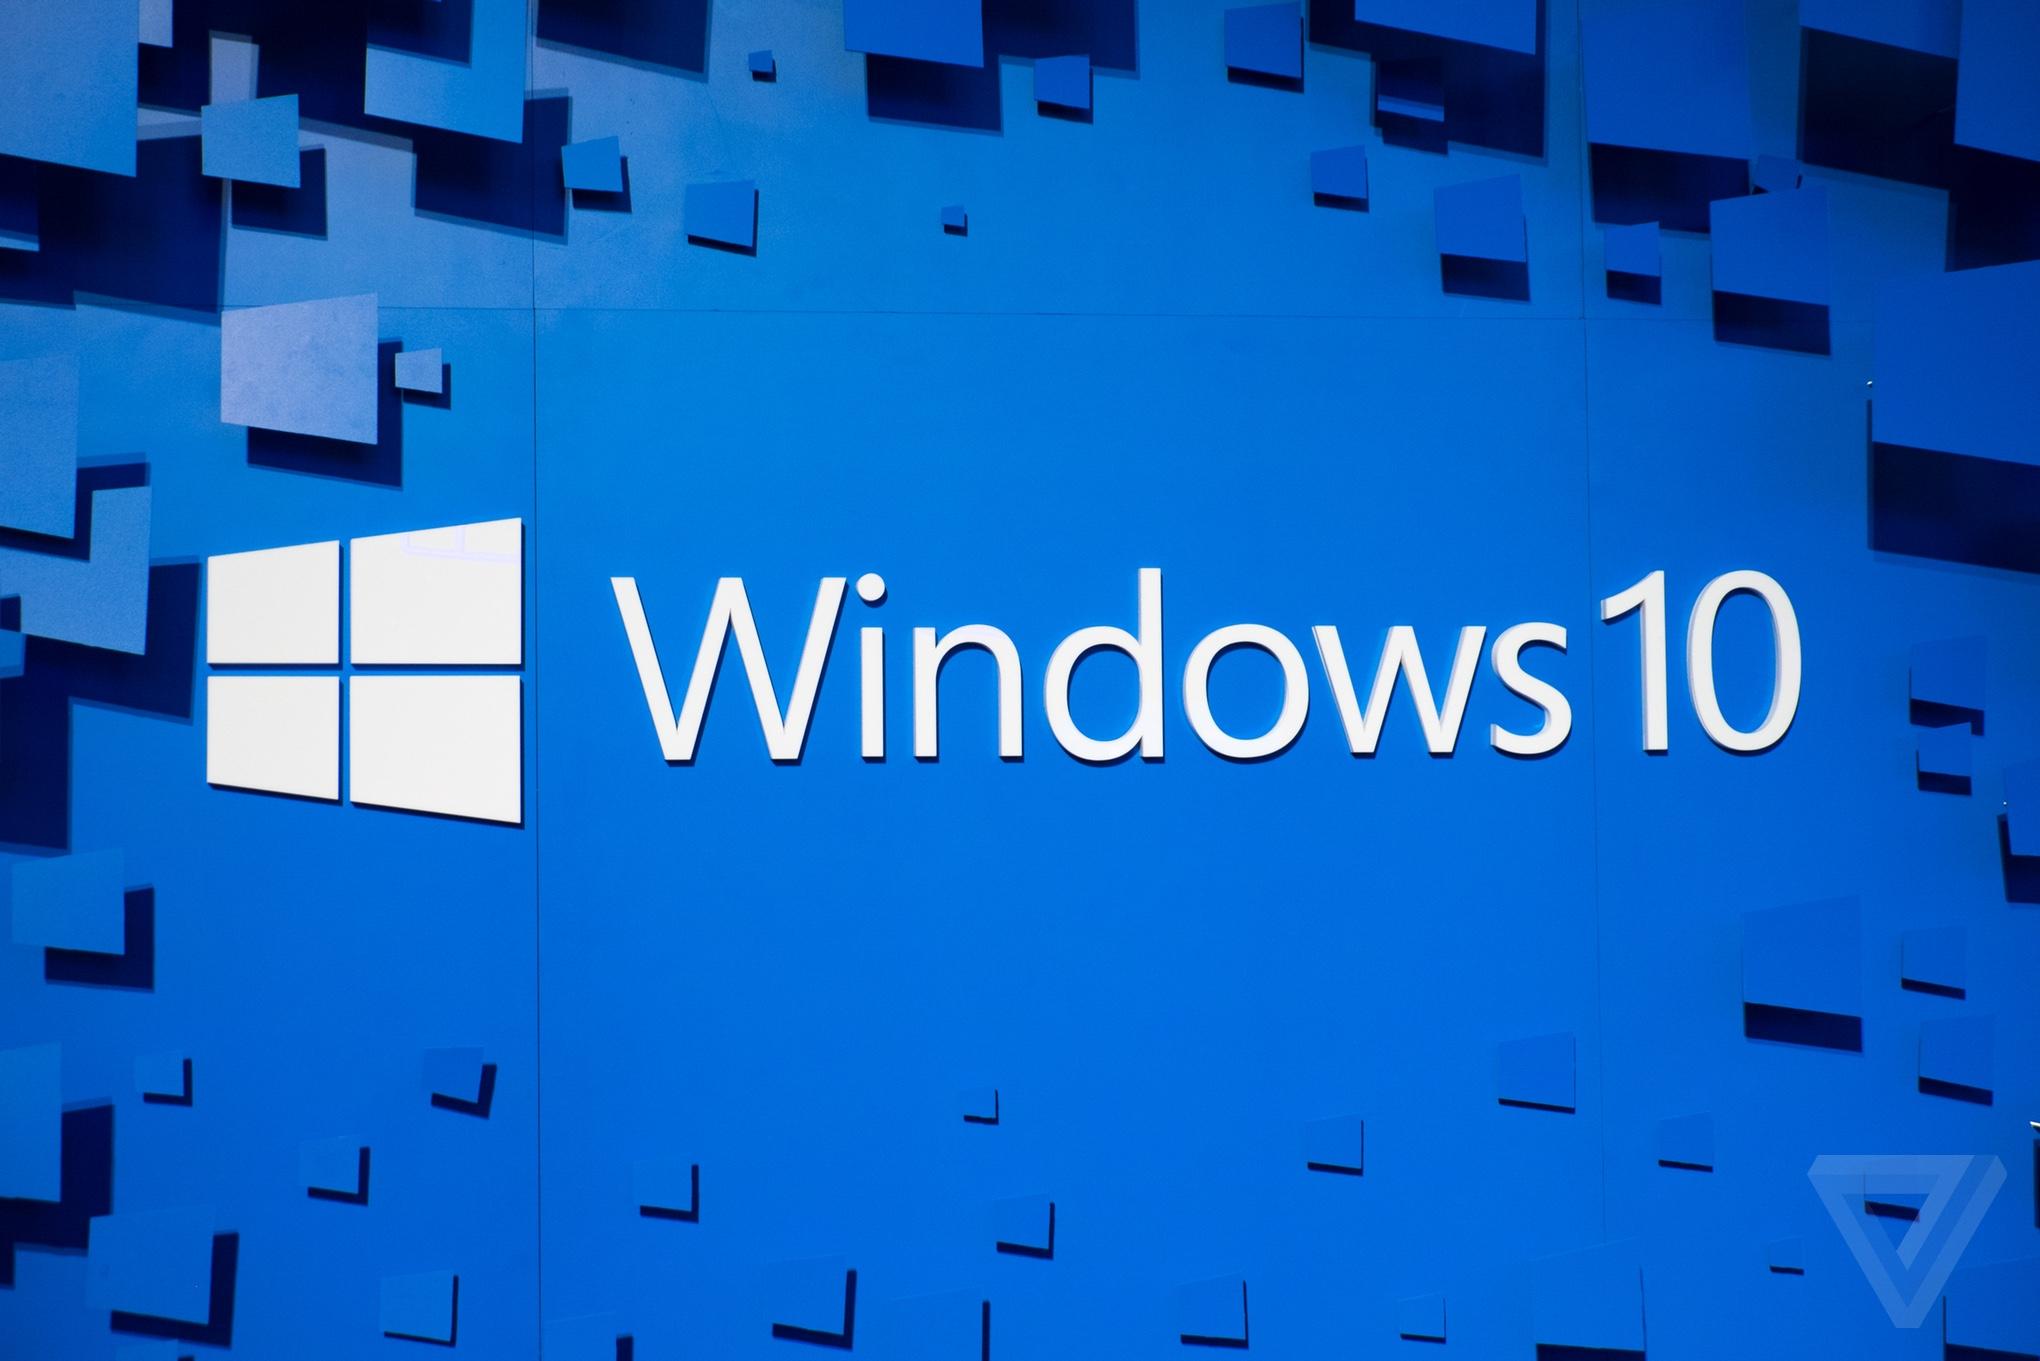 Microsoft starts testing a version of Windows 10 it won't release